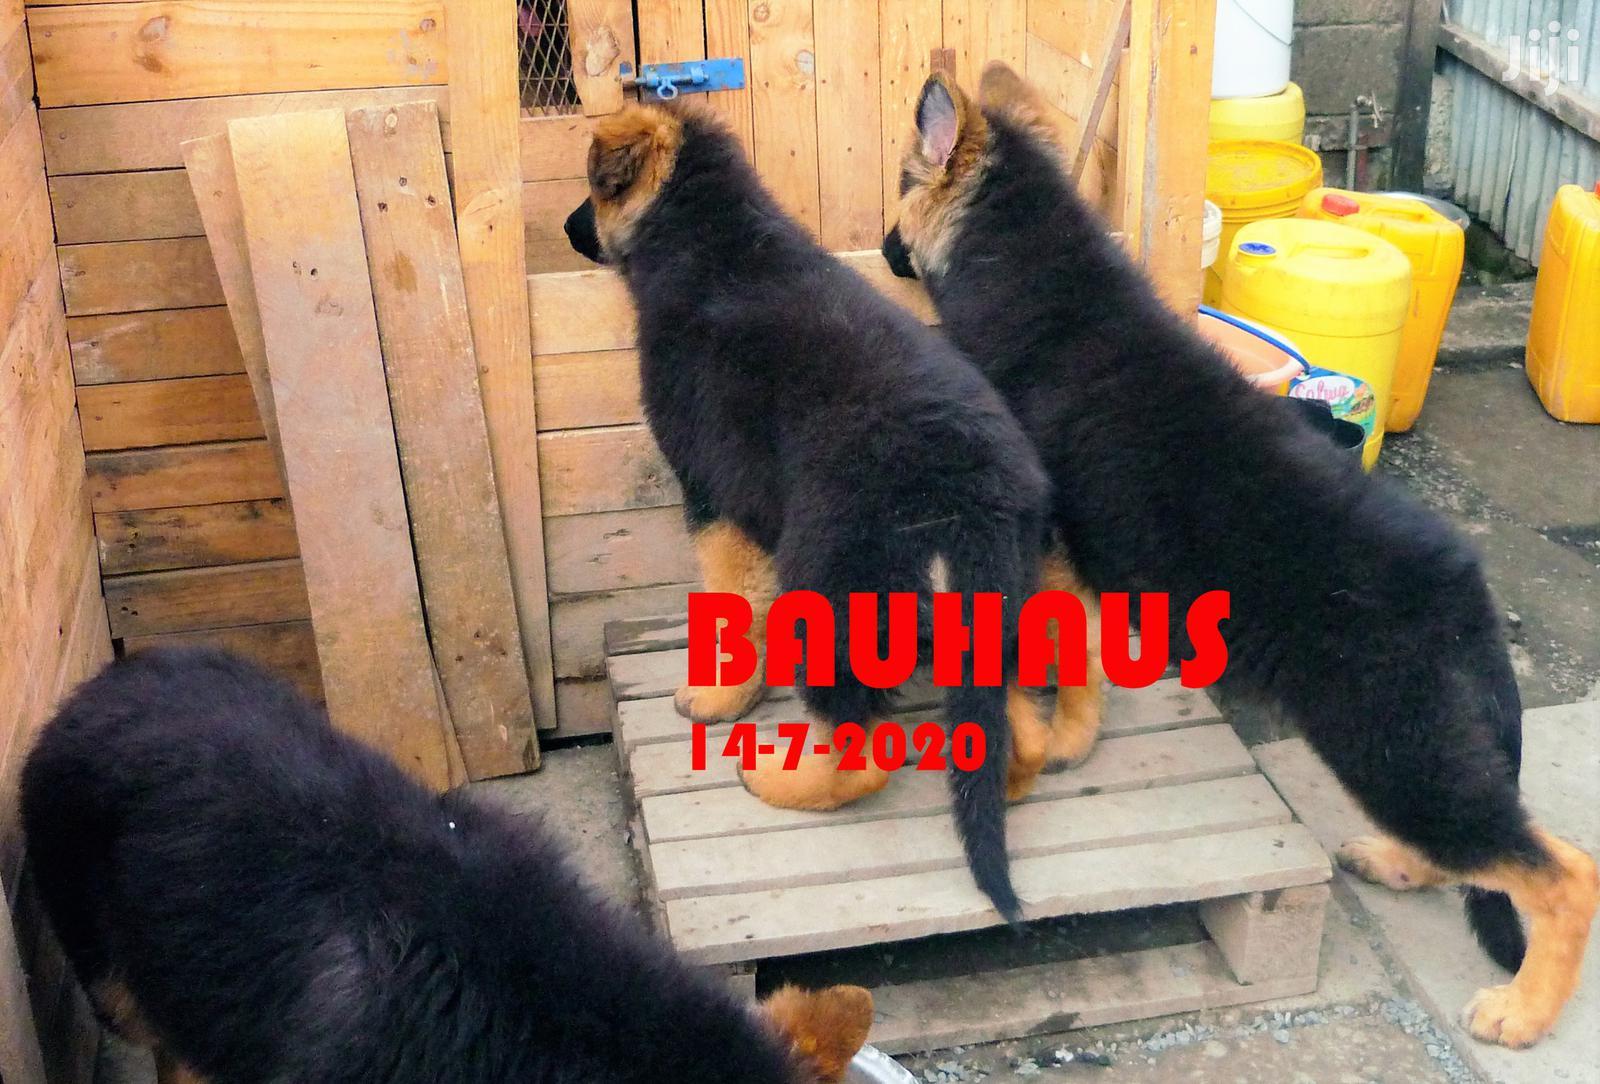 1-3 month Male Purebred German Shepherd | Dogs & Puppies for sale in BuruBuru, Nairobi, Kenya